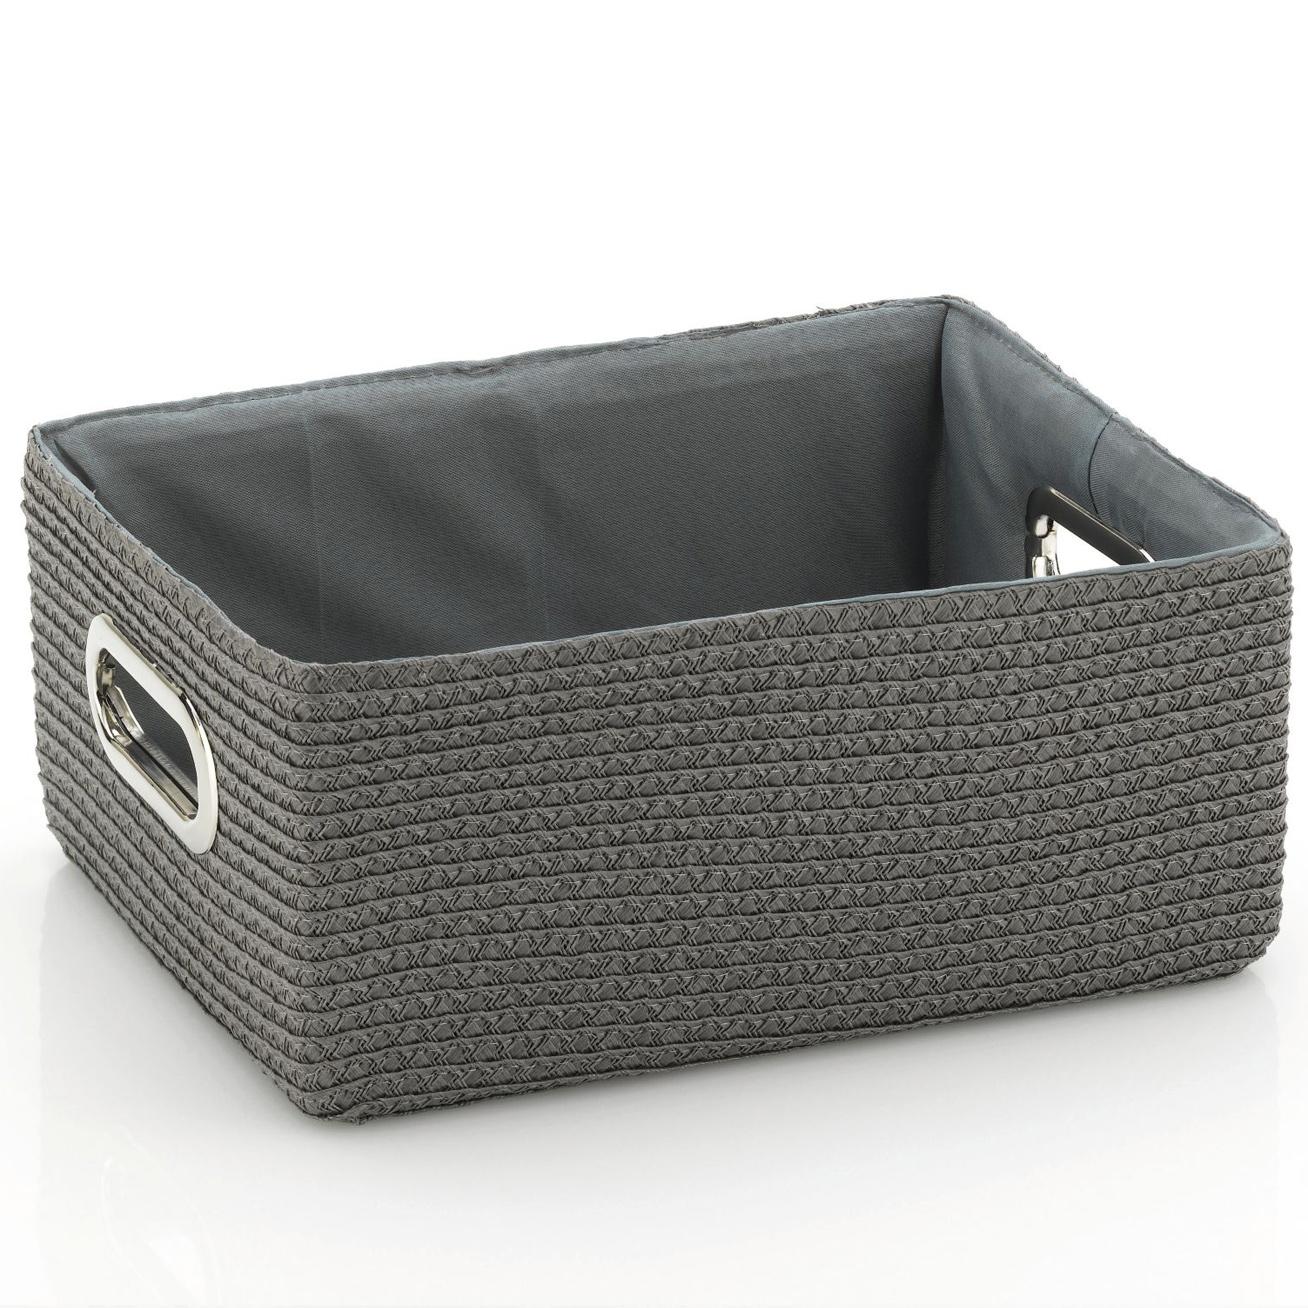 korb kiste box k rbchen aufbewahrungskorb dekokorb regalkorb ebay. Black Bedroom Furniture Sets. Home Design Ideas